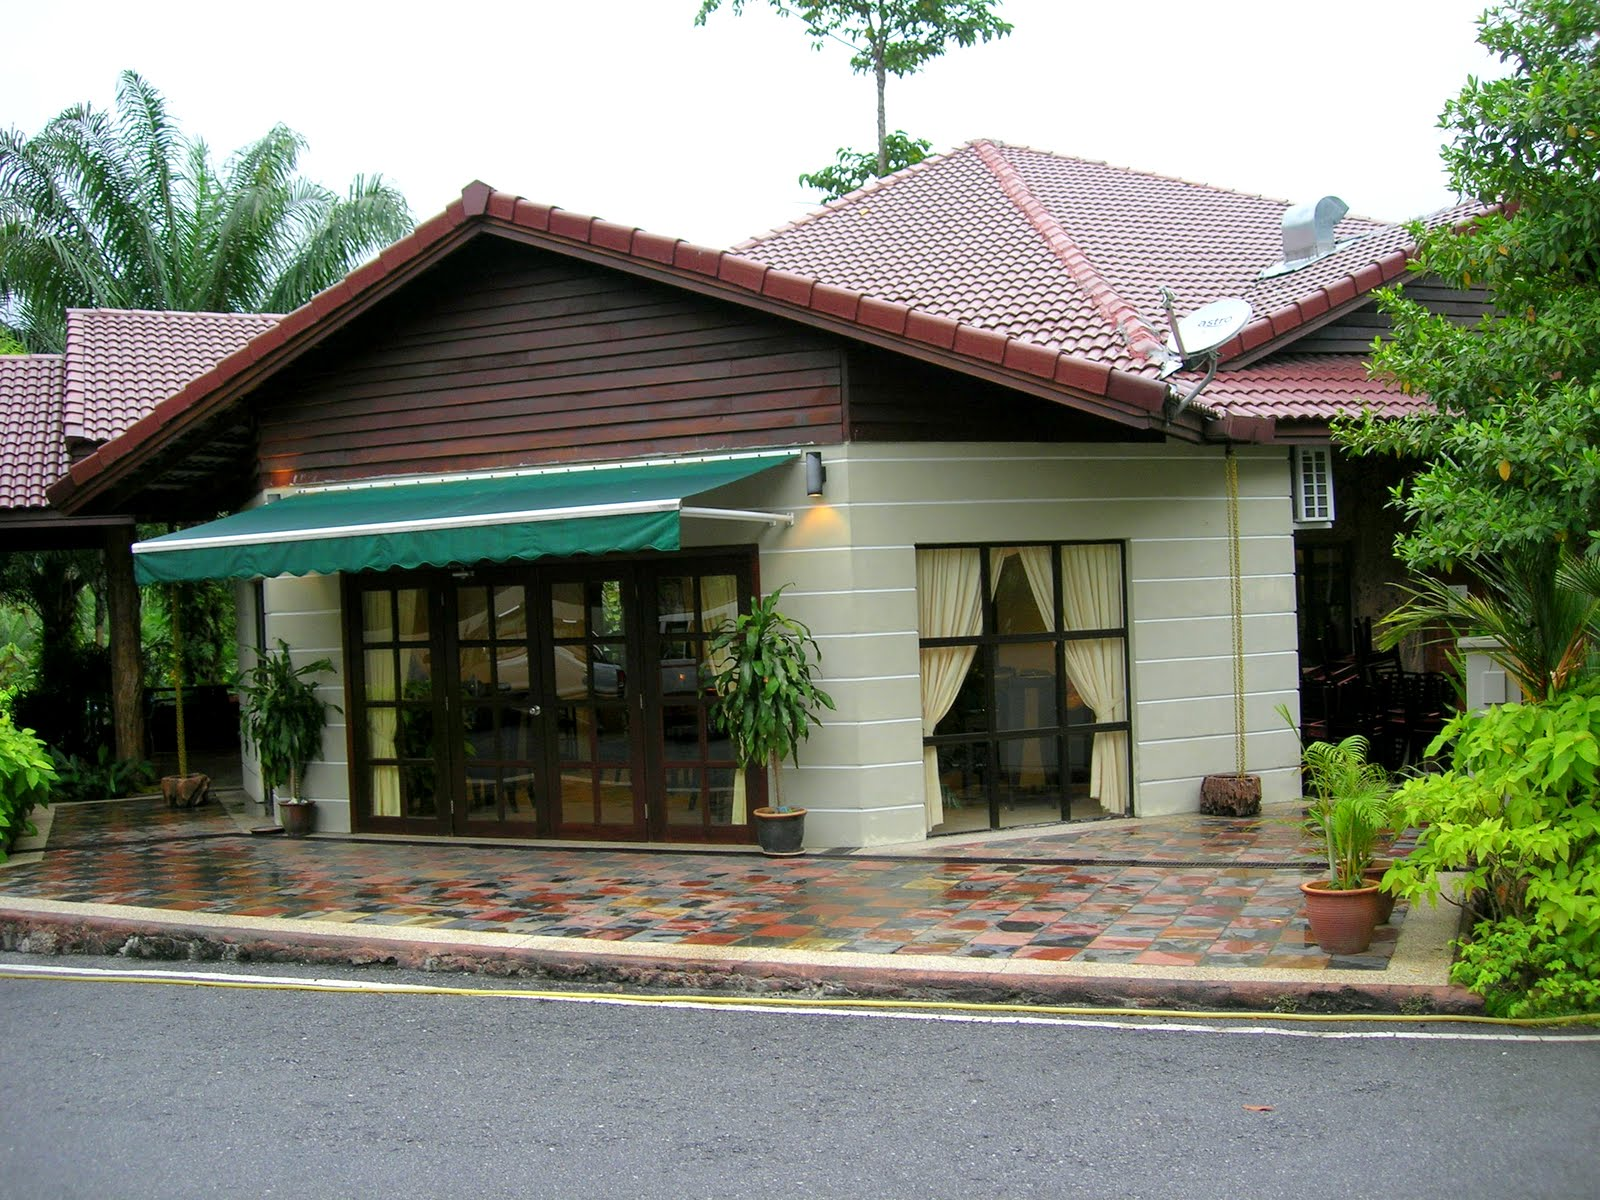 Sungai klah hot springs - Restaurant And Cafe Near The Bungalows